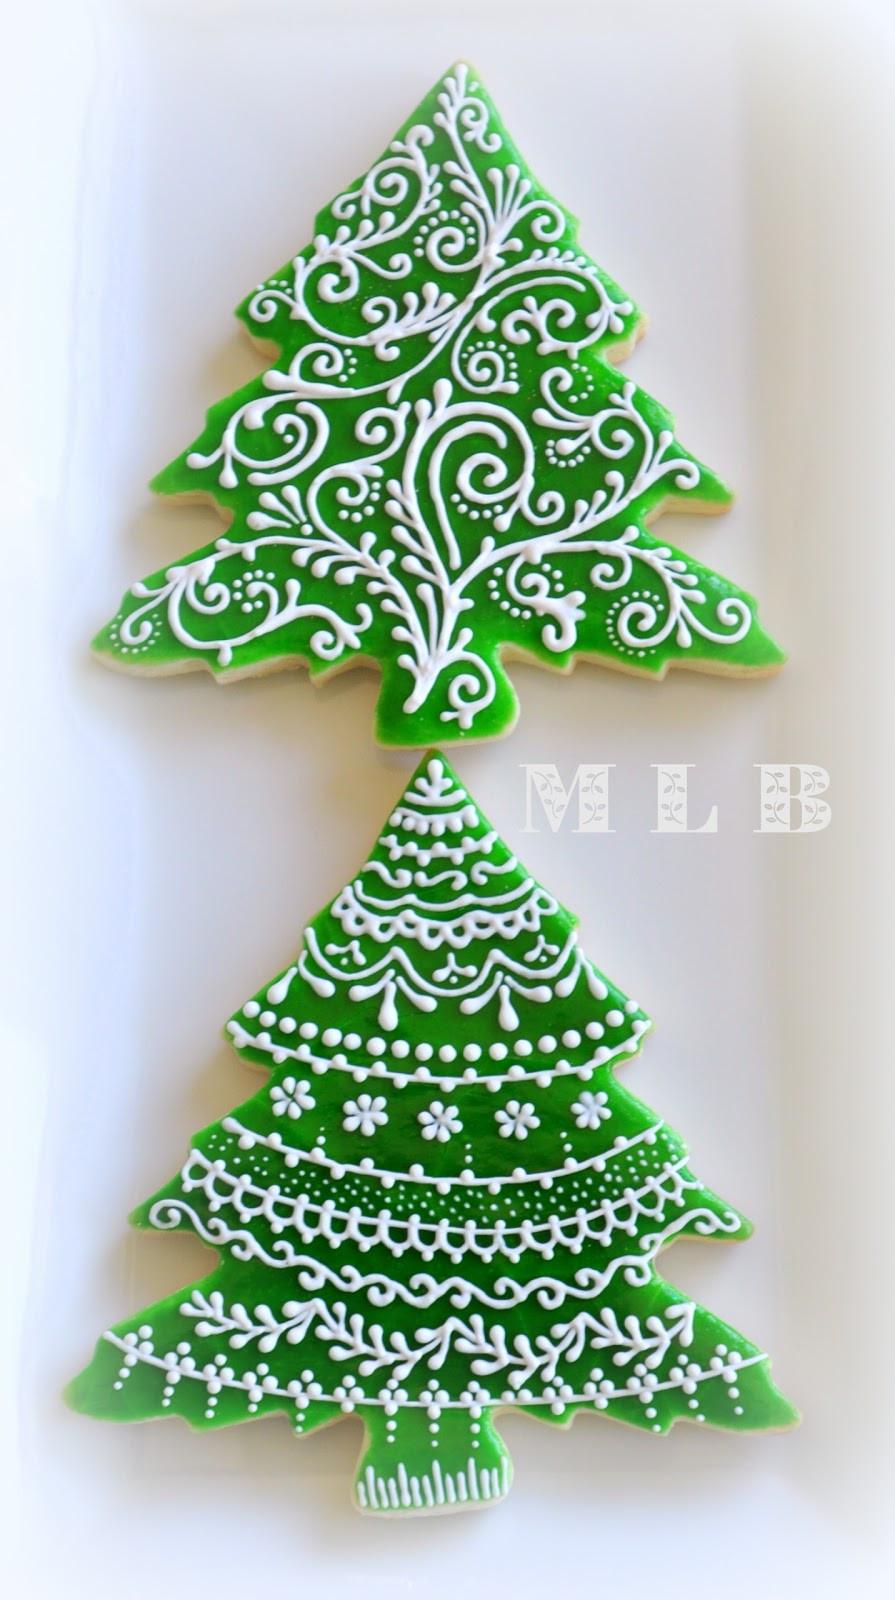 Christmas Tree Cookies Recipe  My little bakery 🌹 Christmas tree cookies And polish